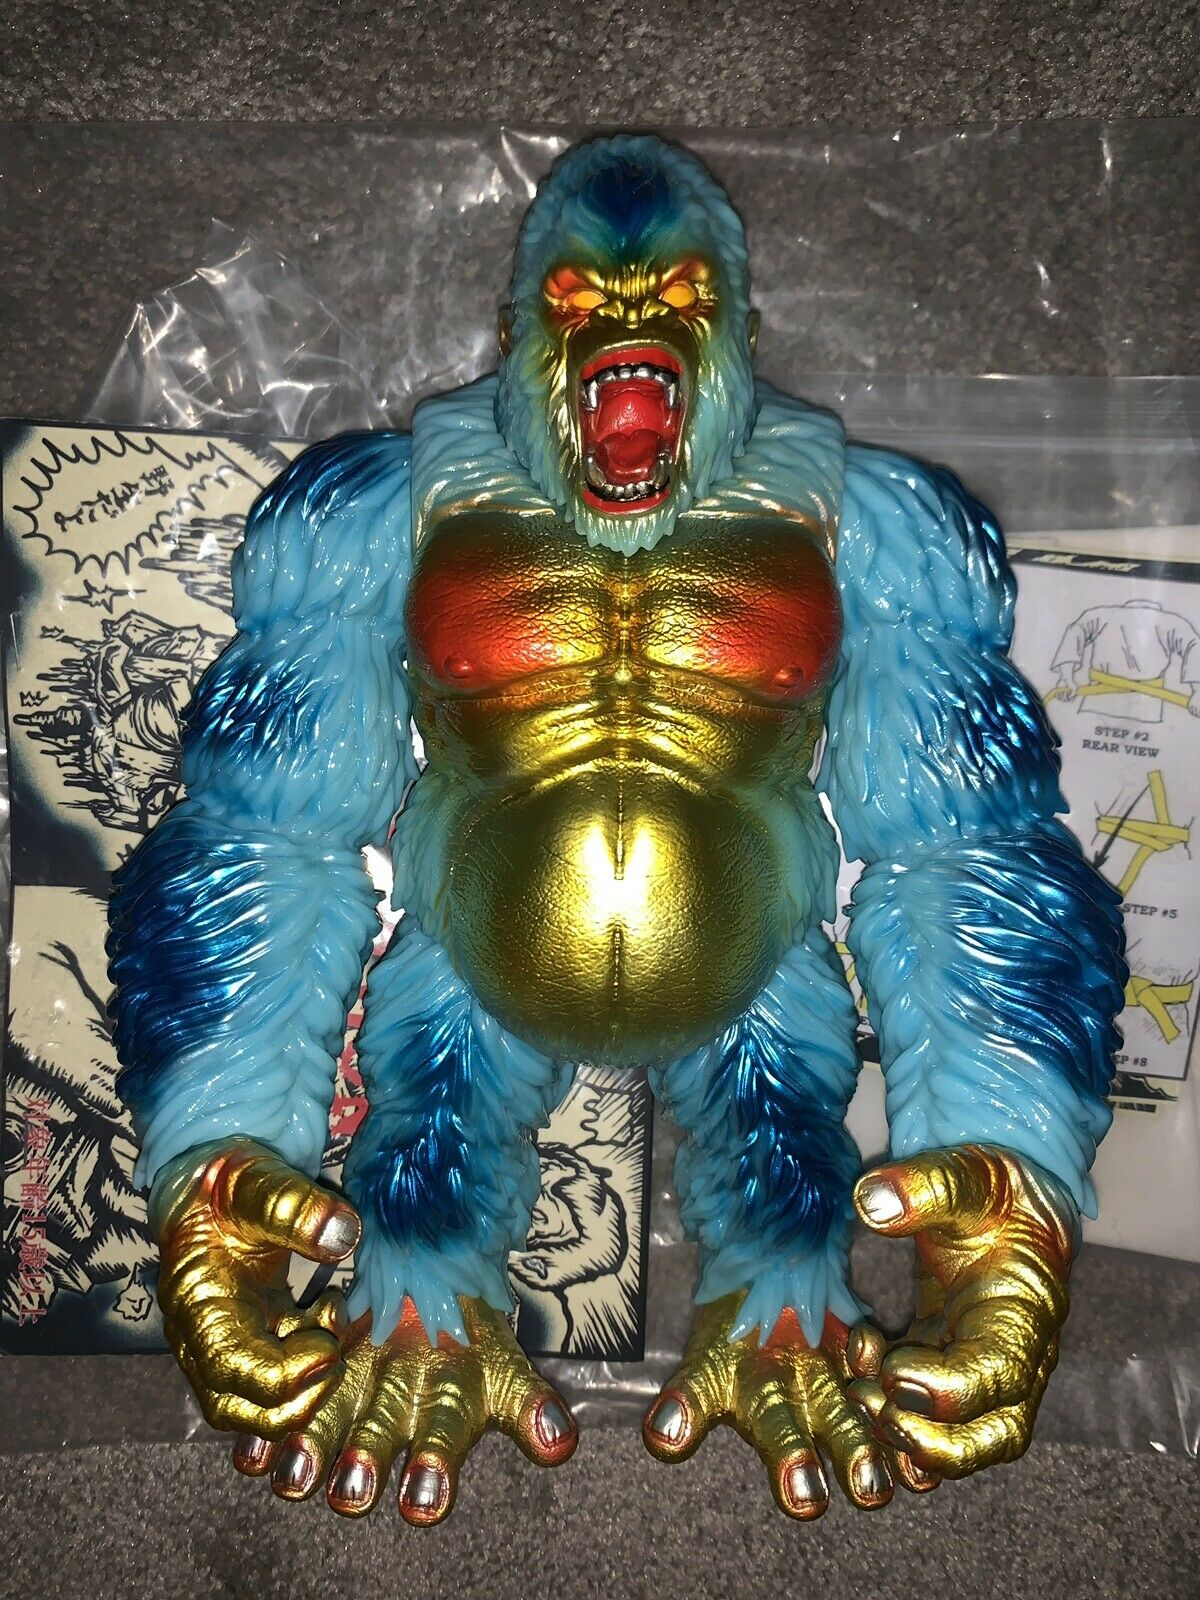 Planet X Death Goliathon bluee & gold Vinyl Figure With Jacket Sofubi Kaiju